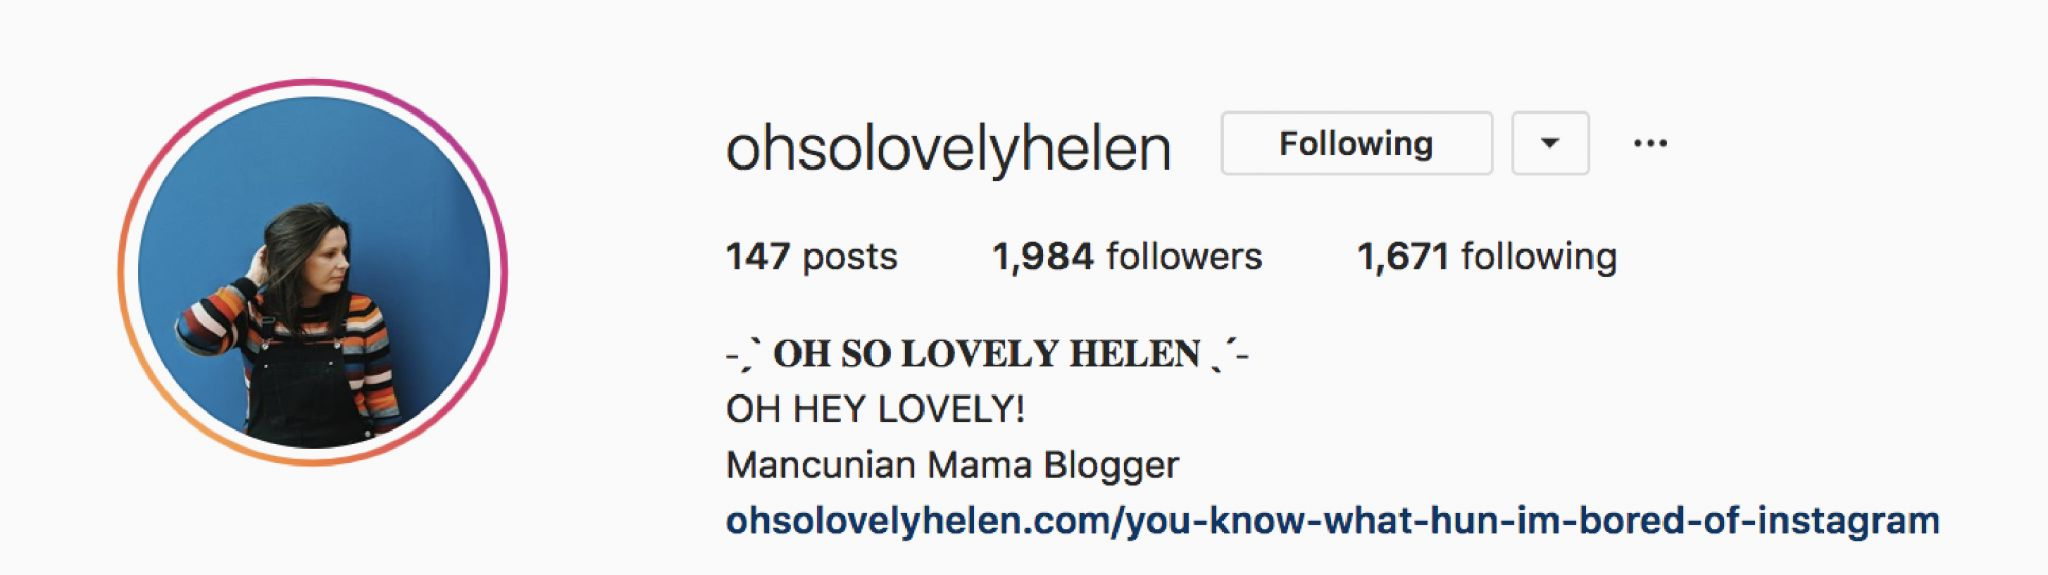 change font in instagram bio